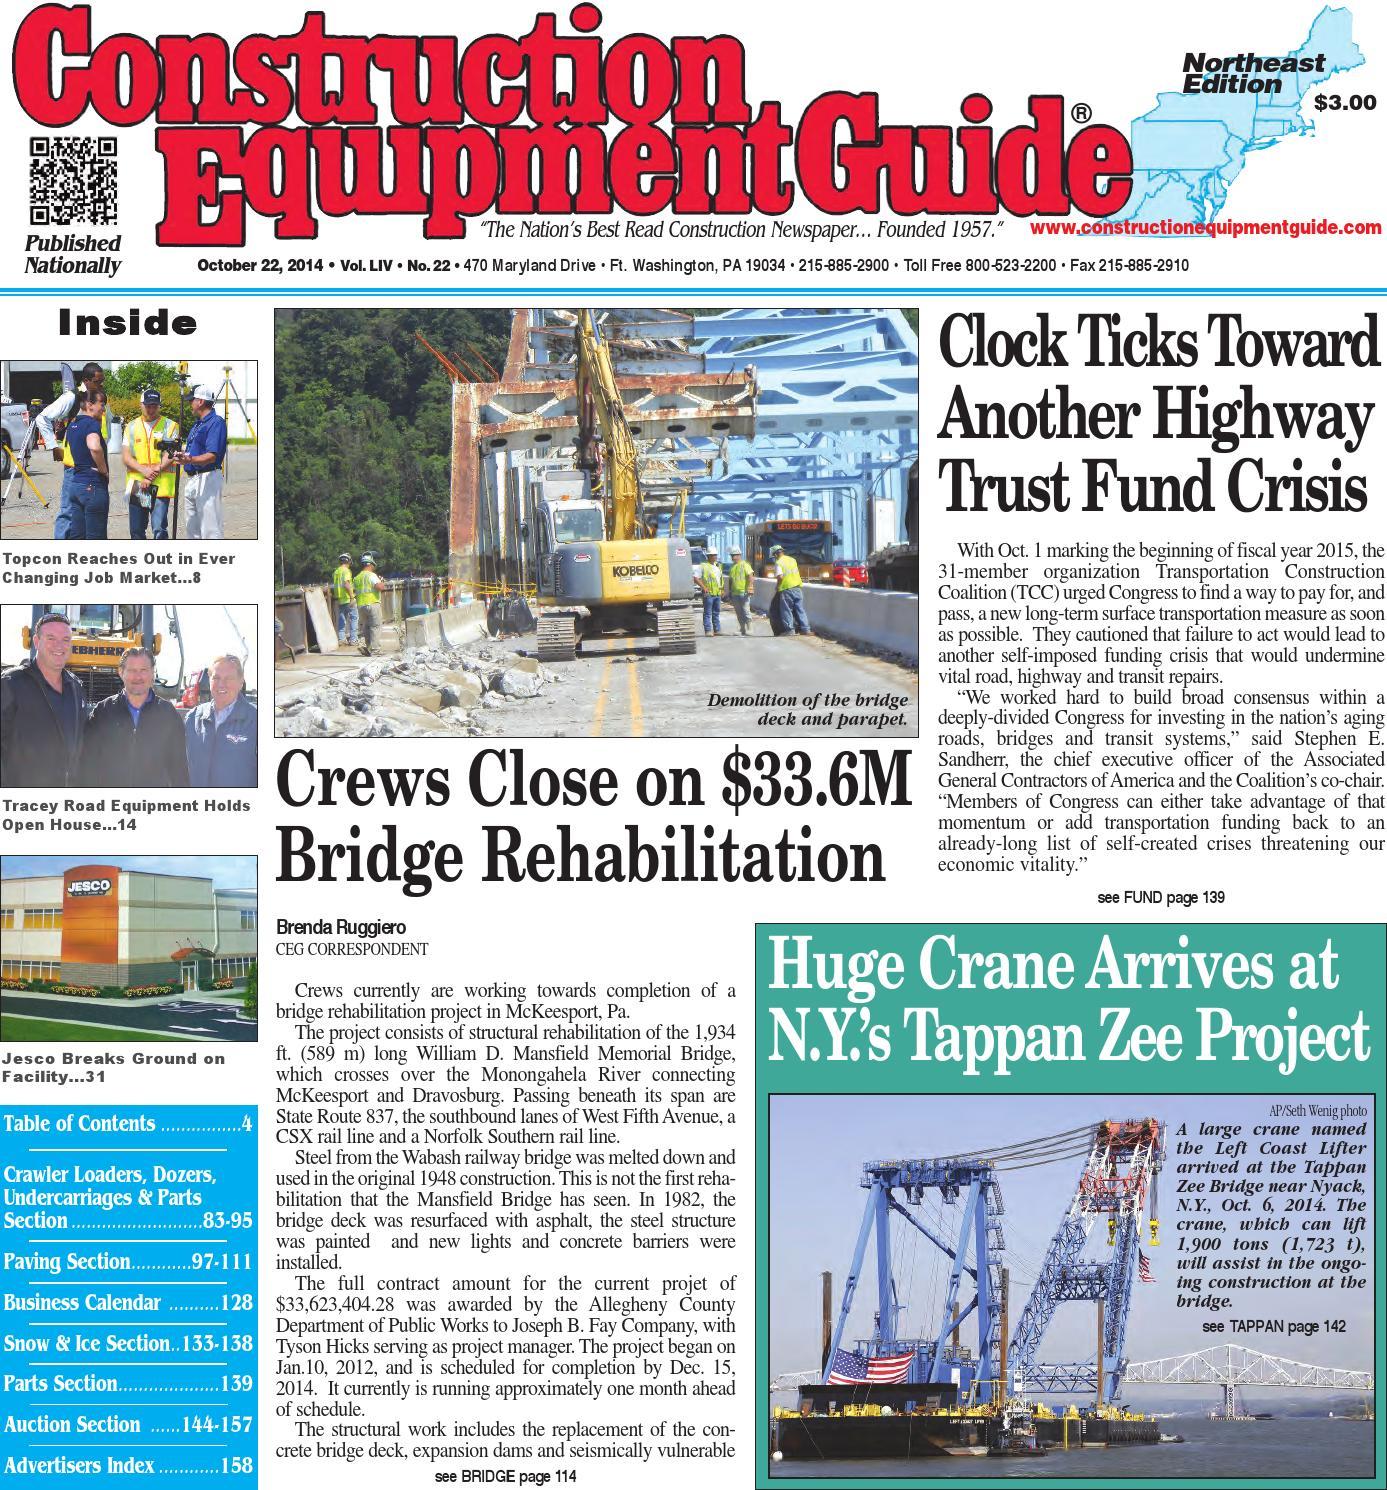 Northeast 22 2014 By Construction Equipment Guide Issuu Door Closure Wiring Diagram 279c Cat